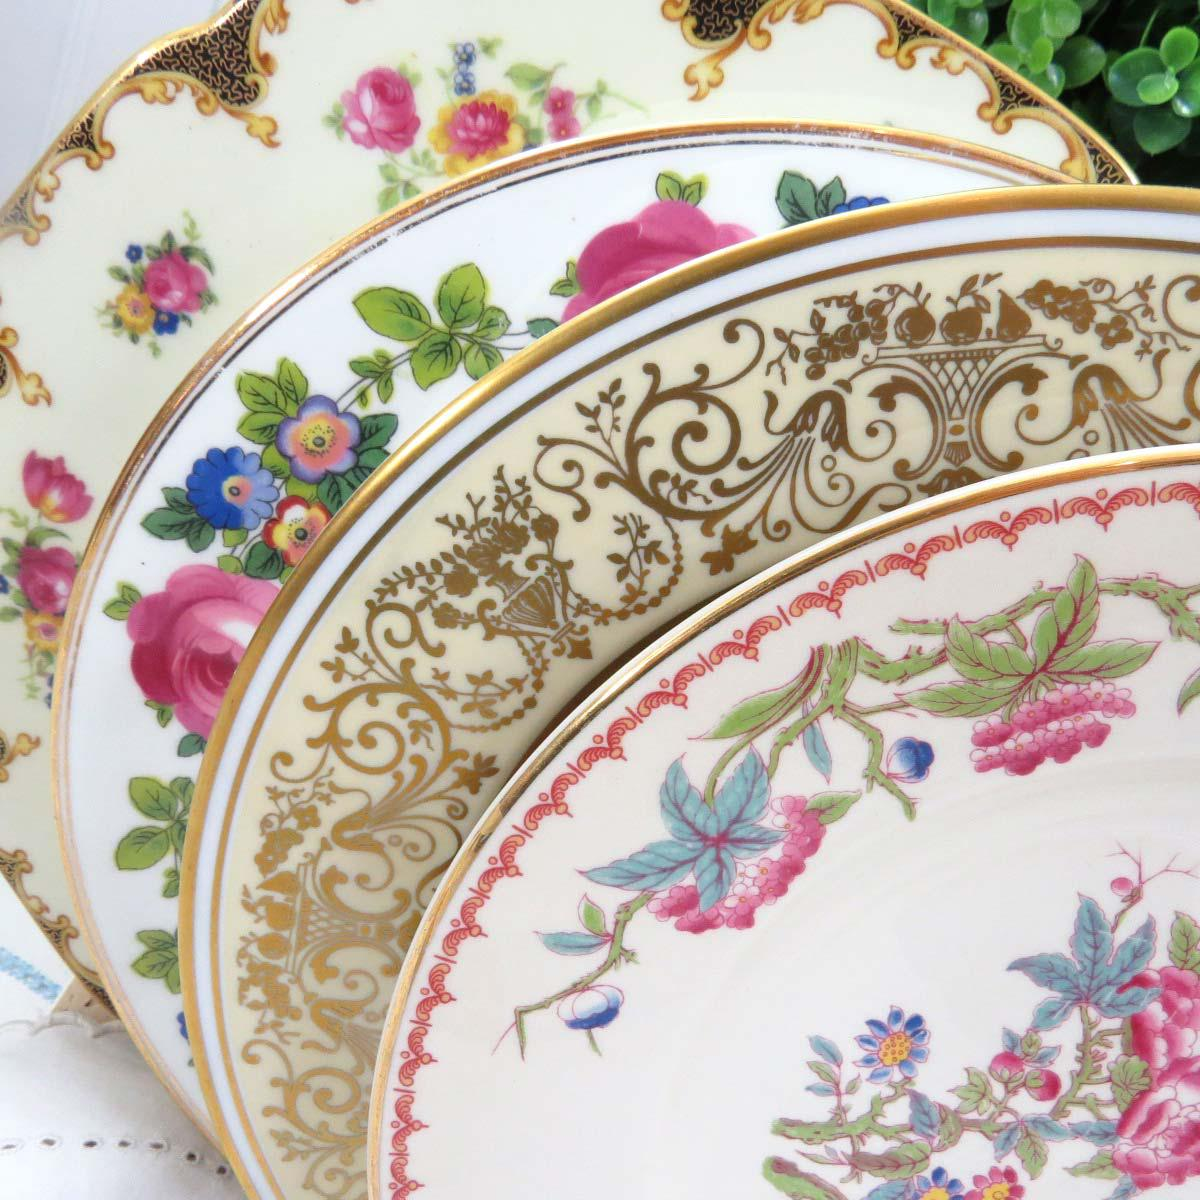 Vintage Mismatched Fine China Dinner Plates - Set of 4 - Image 2 of 10 & Vintage Mismatched Fine China Dinner Plates - Set of 4 | Chairish